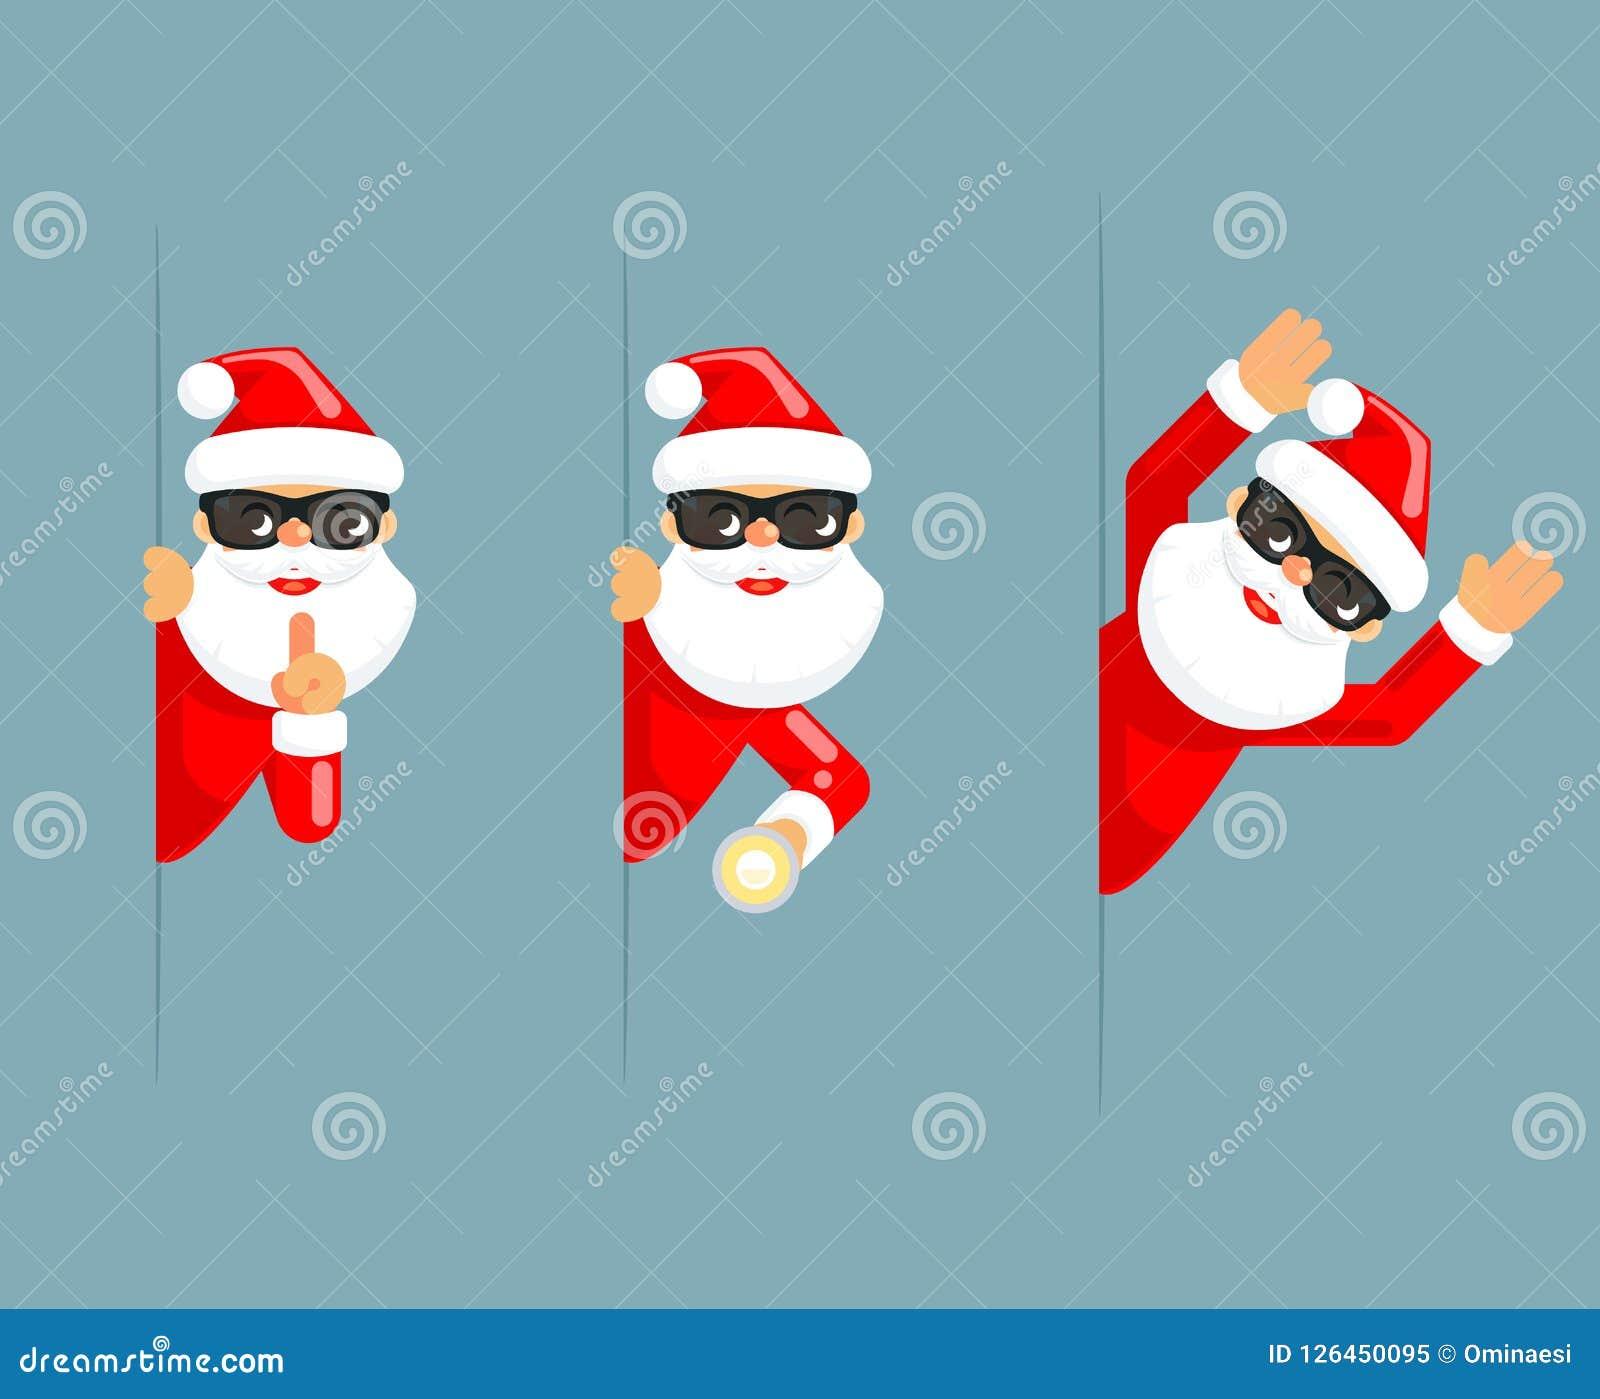 Secret santa greetings messages topsimages download secret santa claus flashlight peeking out corner surrender give up cartoon characters set flat design m4hsunfo